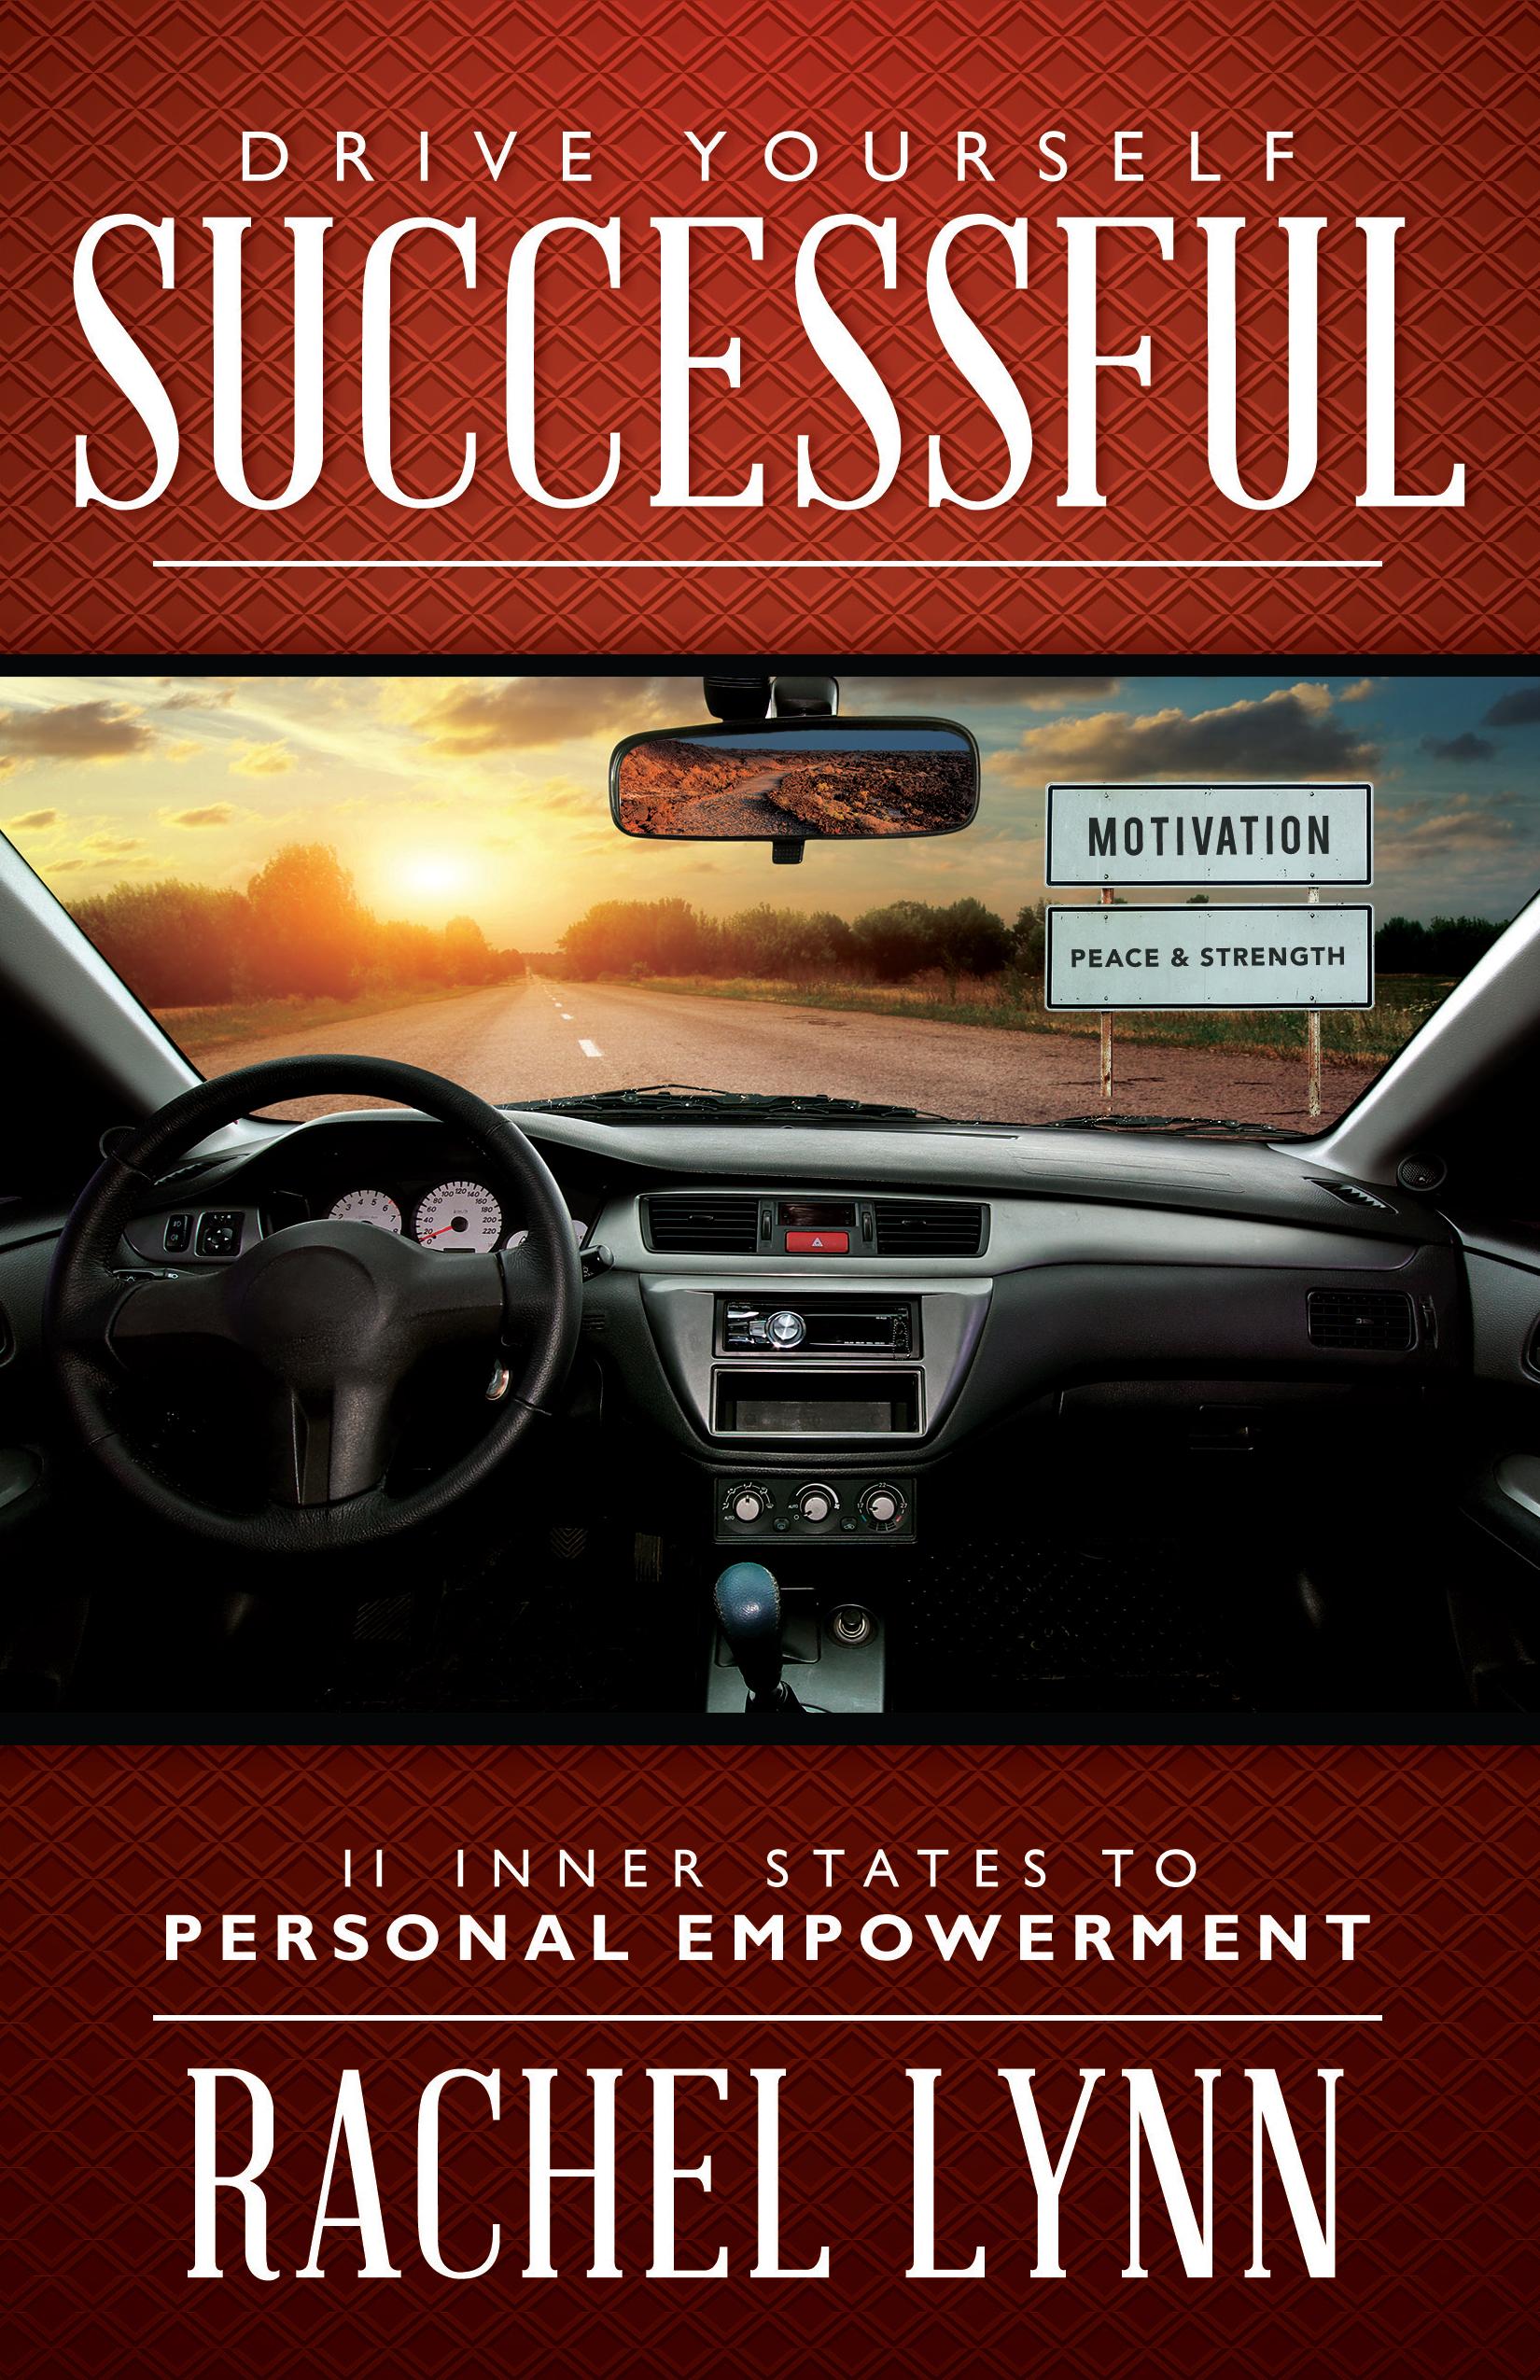 Drive Yourself Successful - Rachel Lynn